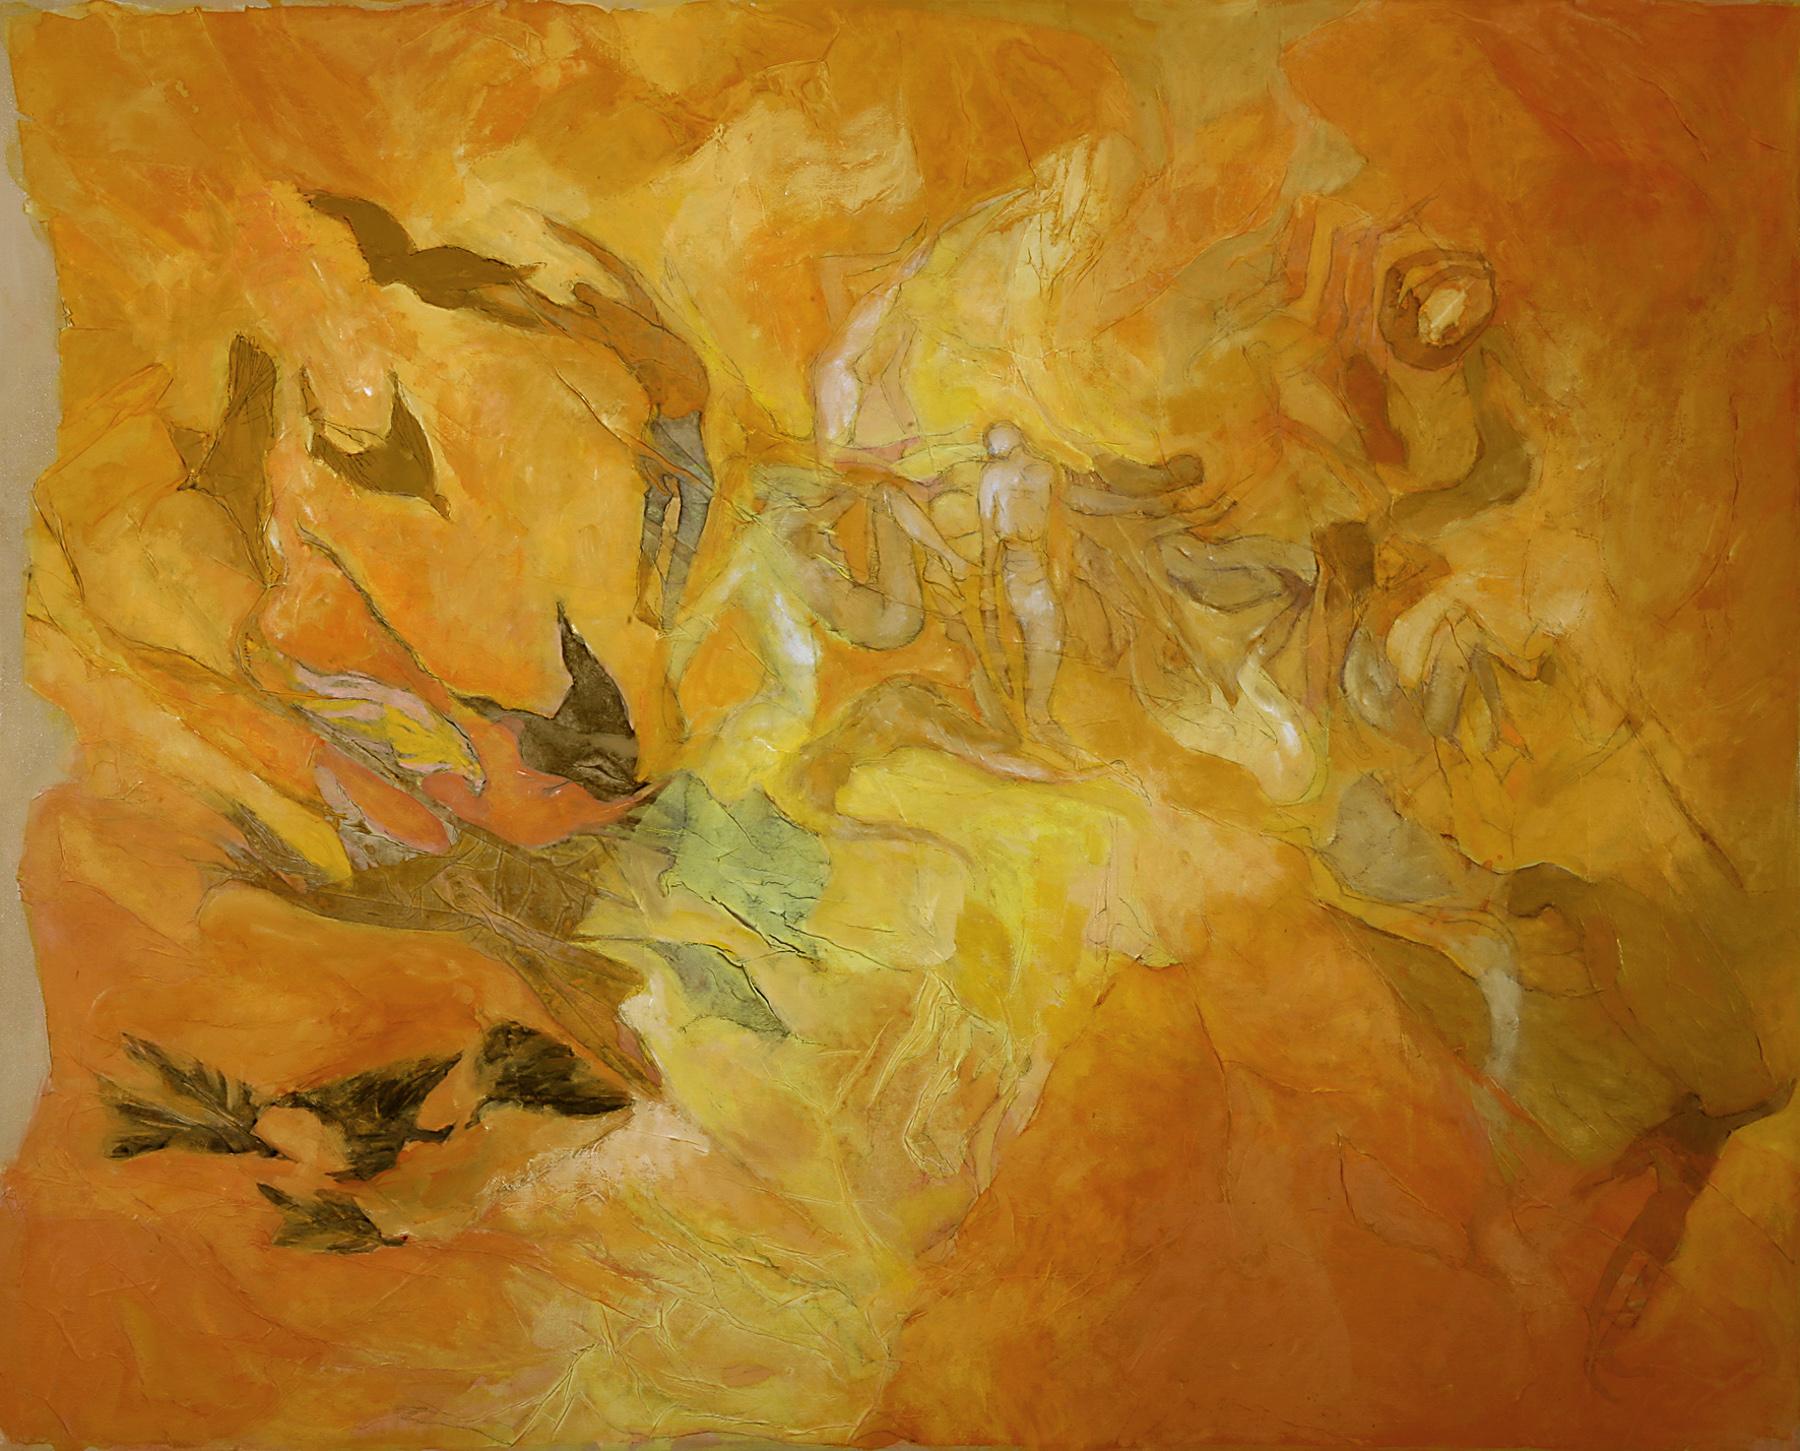 Como pájaros negros - Técnica mixta sobre tela - 100 x 81 cm